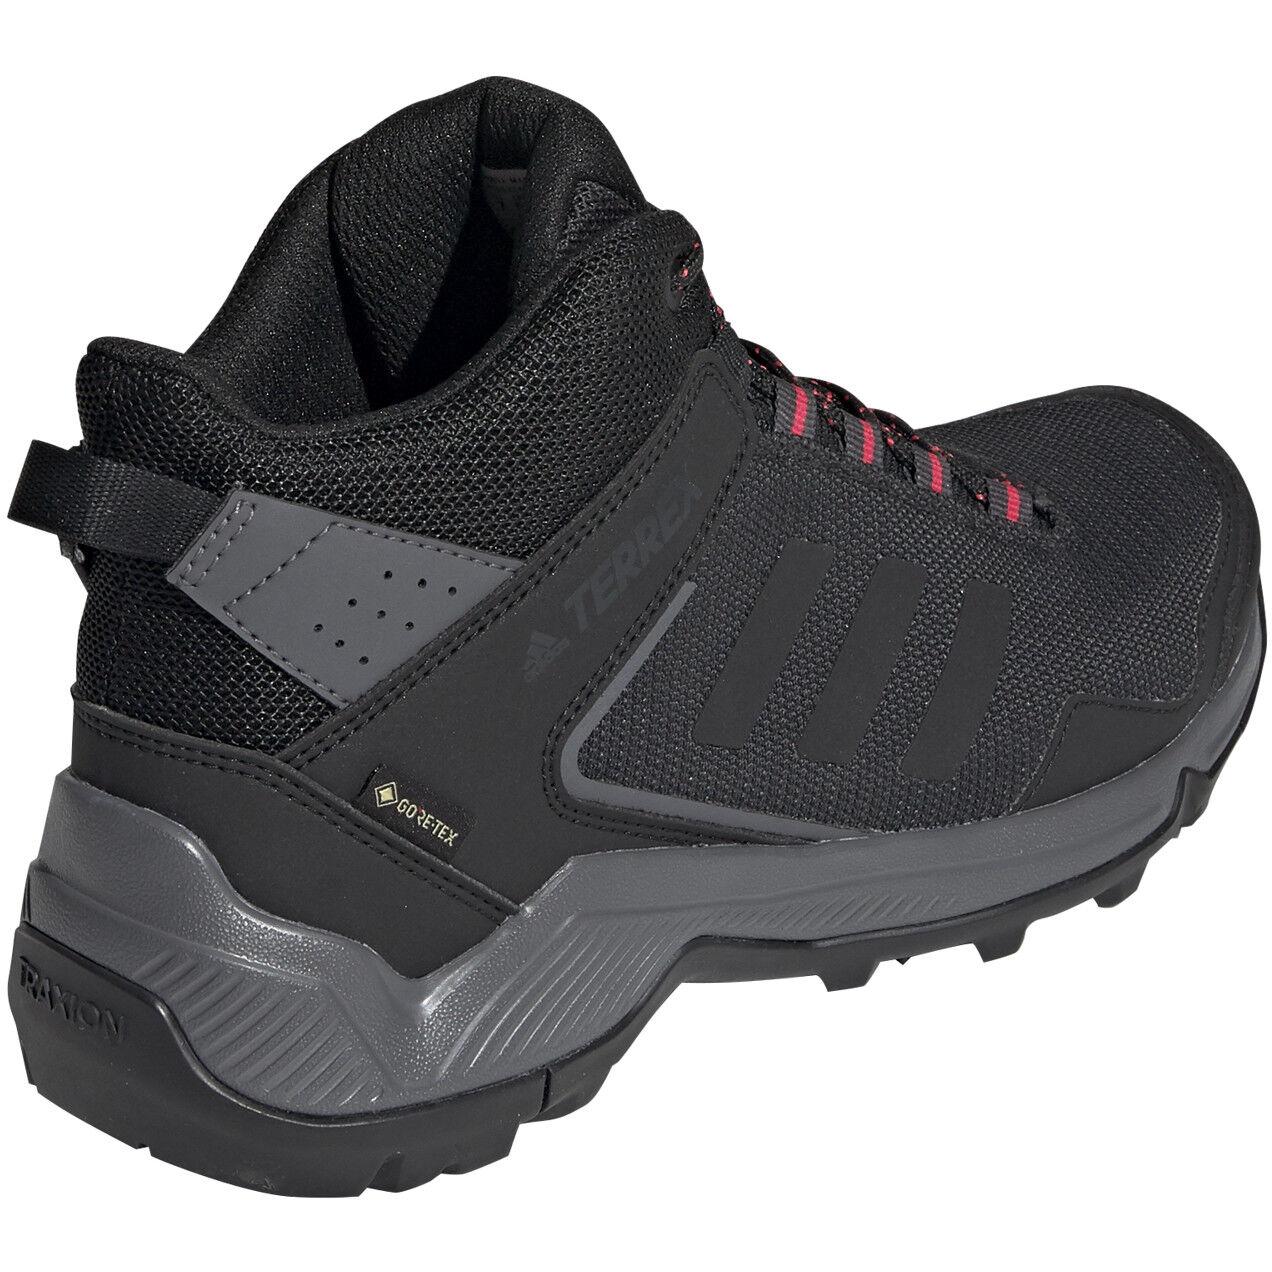 adidas ORIGINALS (Adidas) SUPERSTAR SLIP ON W (superstar slip ons) Lady's shoes sneakers CBLACKCBLACKFTWWHT (black white) S81337 ENDLESS TRIP